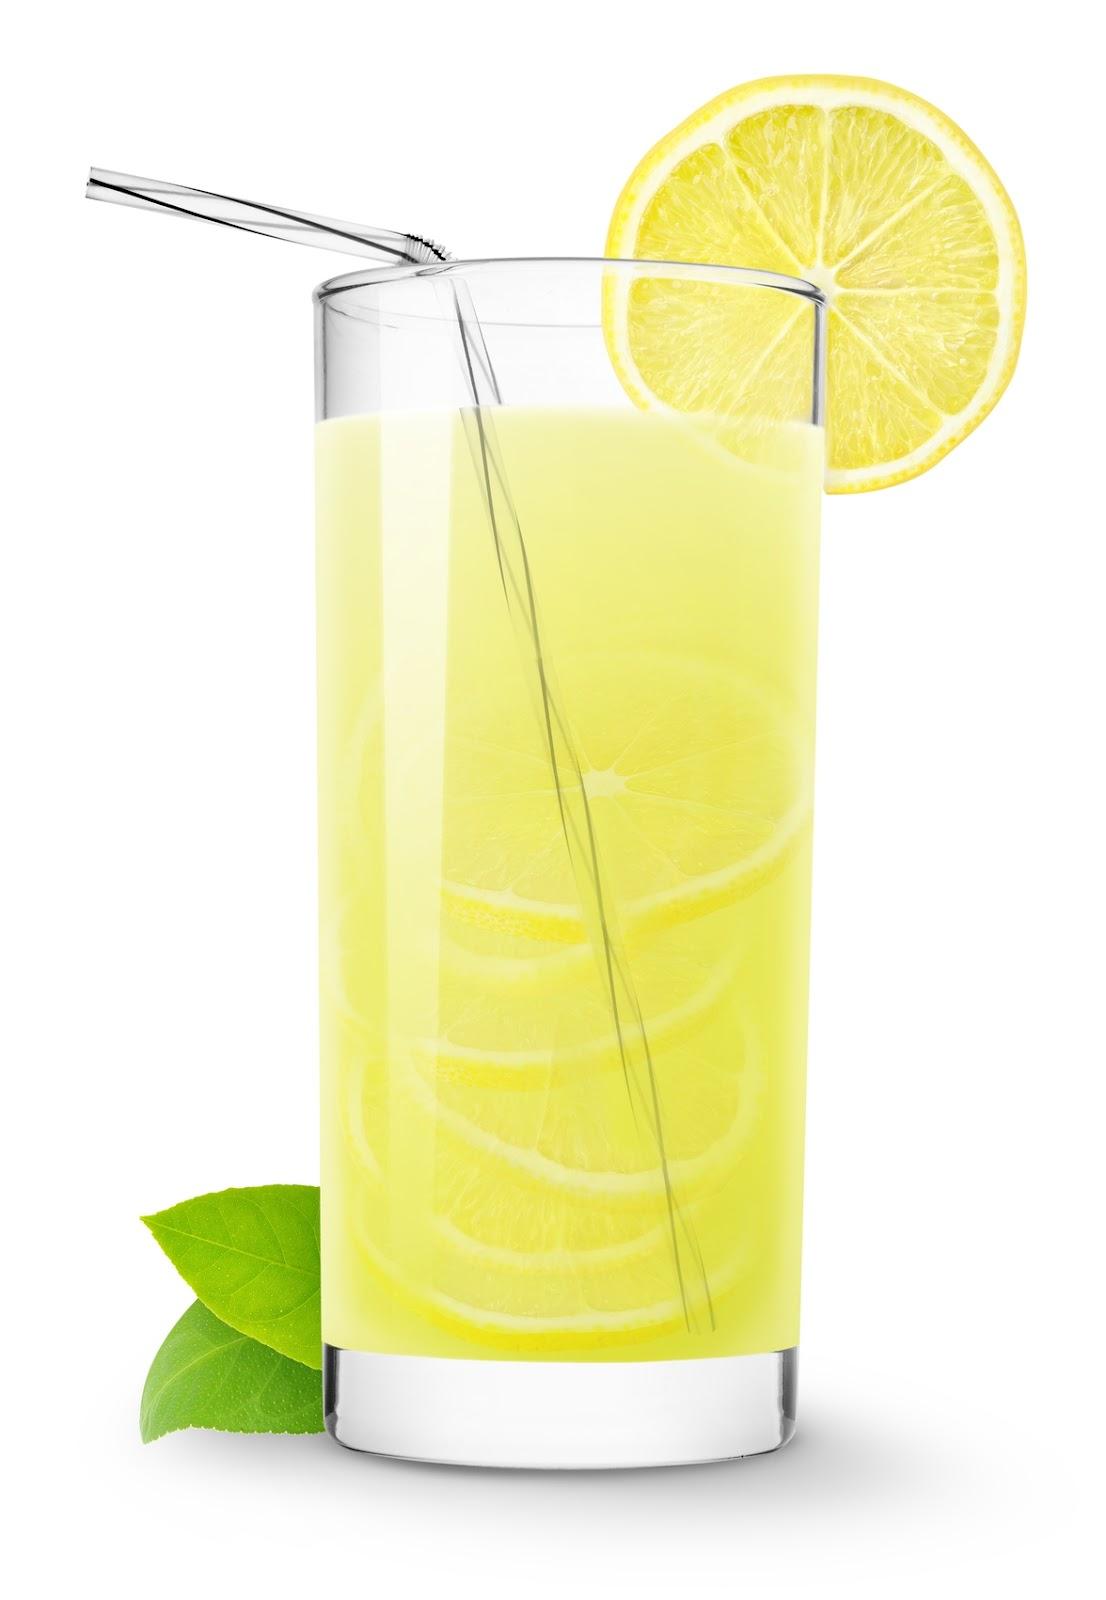 82e3e84e9b021 connecting over life s lemonade